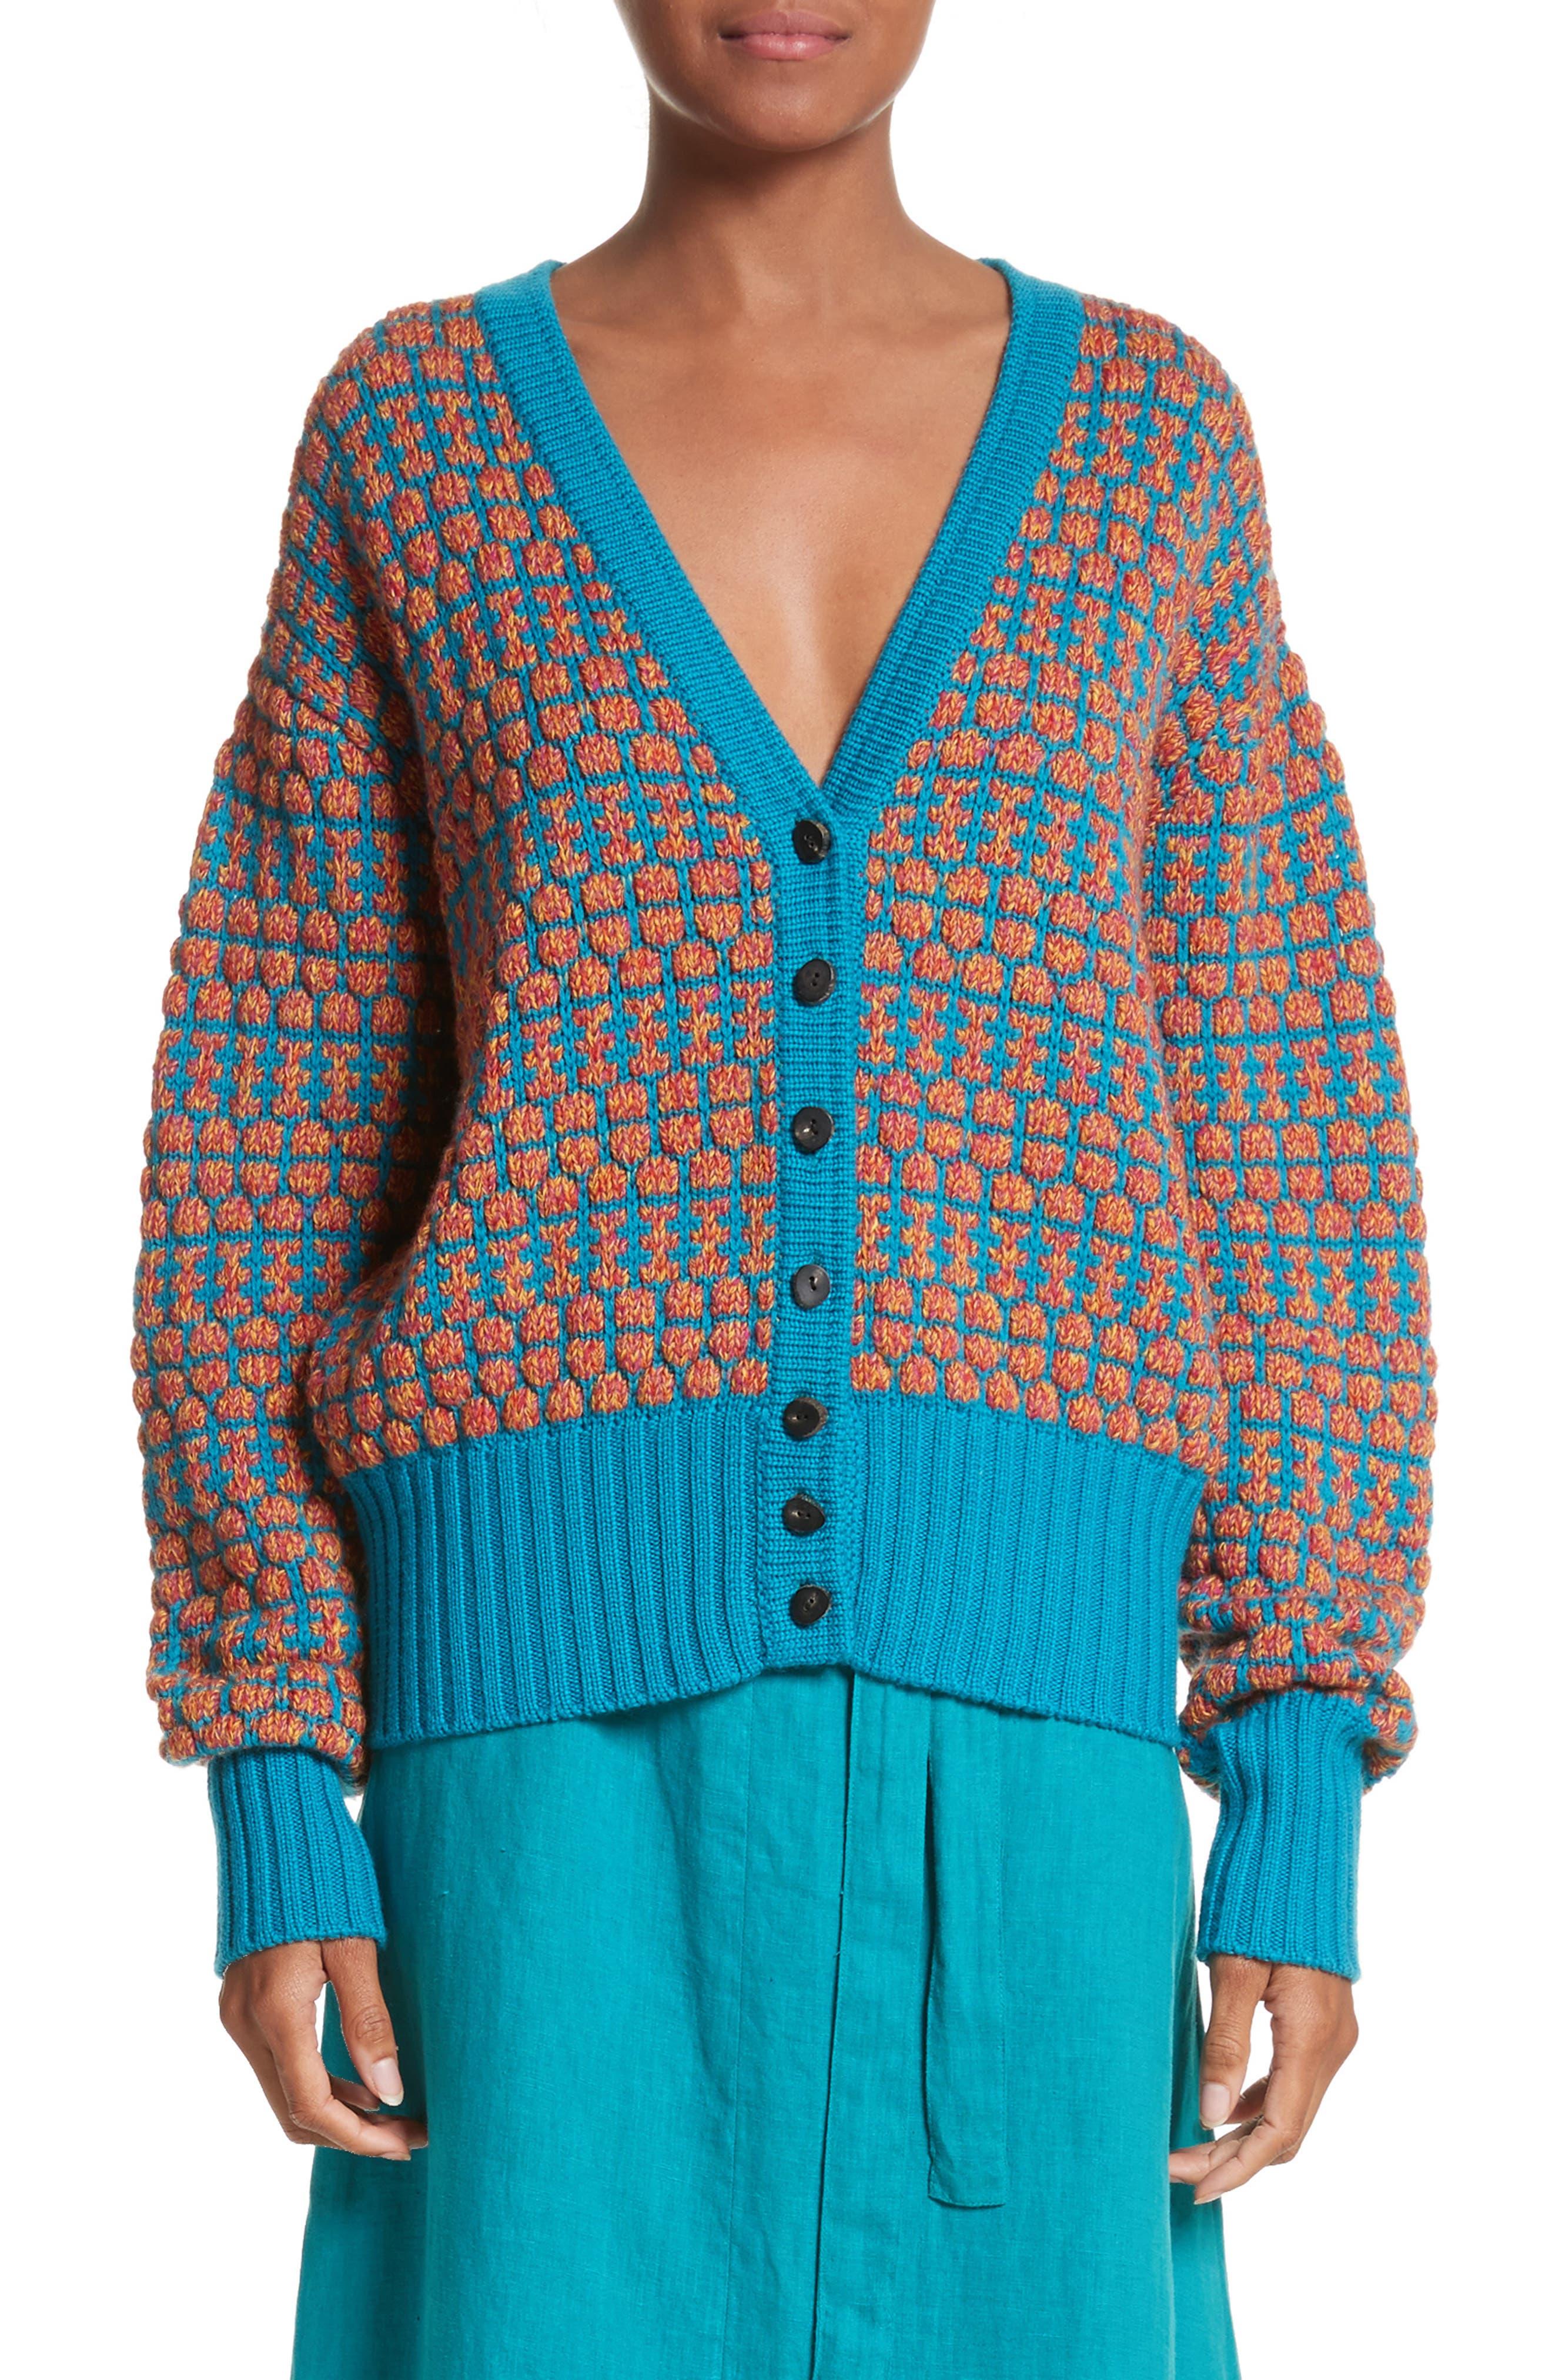 Designer Sweaters: Cardigans, Crewneck & Pullovers   Nordstrom